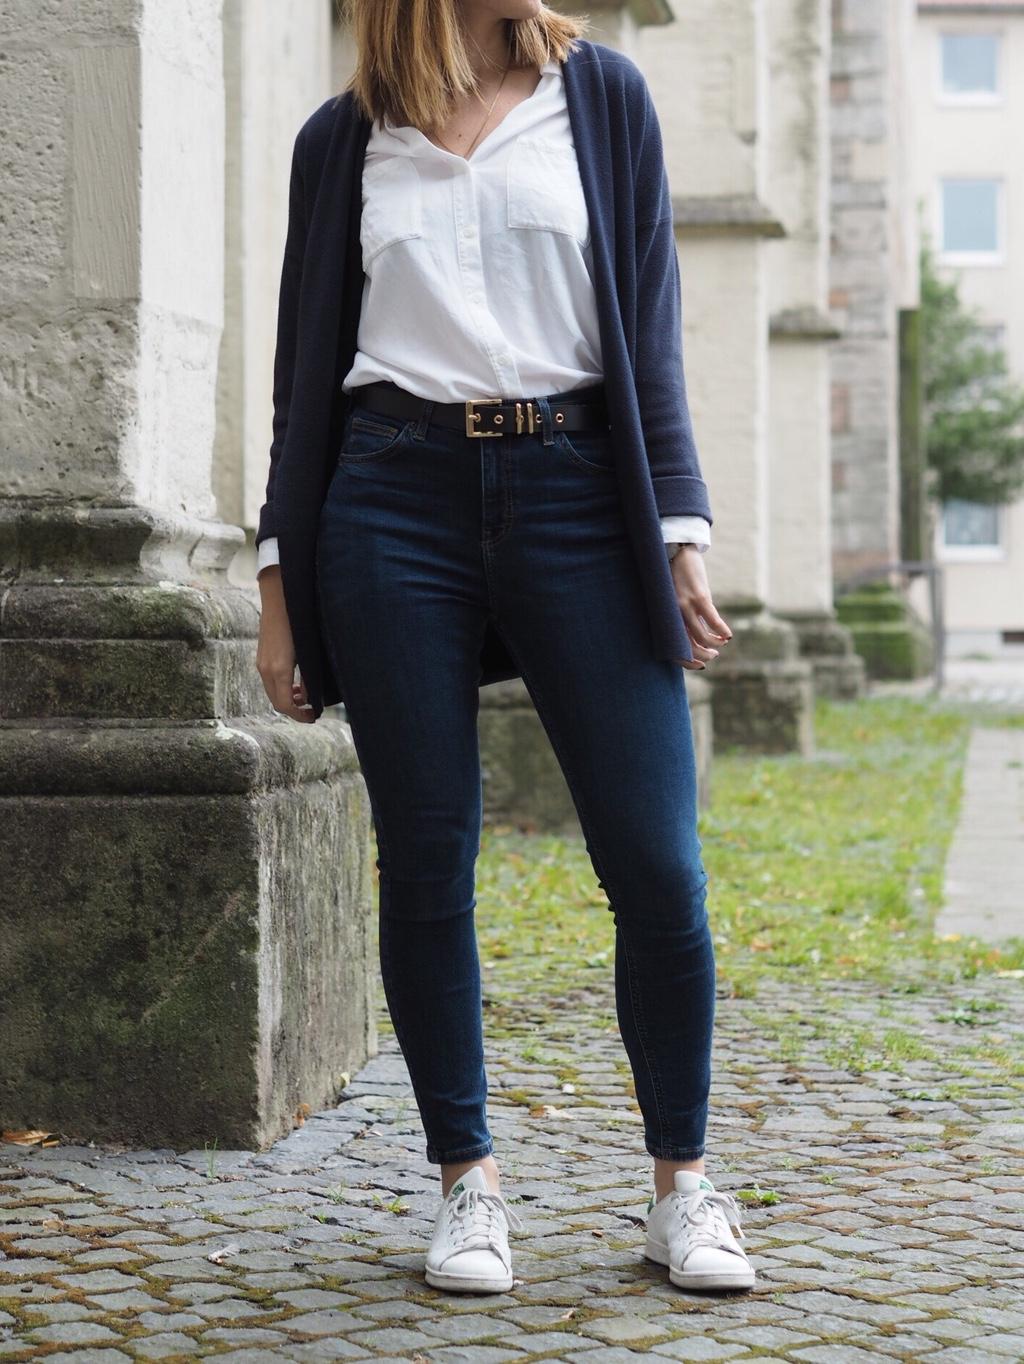 Hoch geschnittene Jeans Outfit